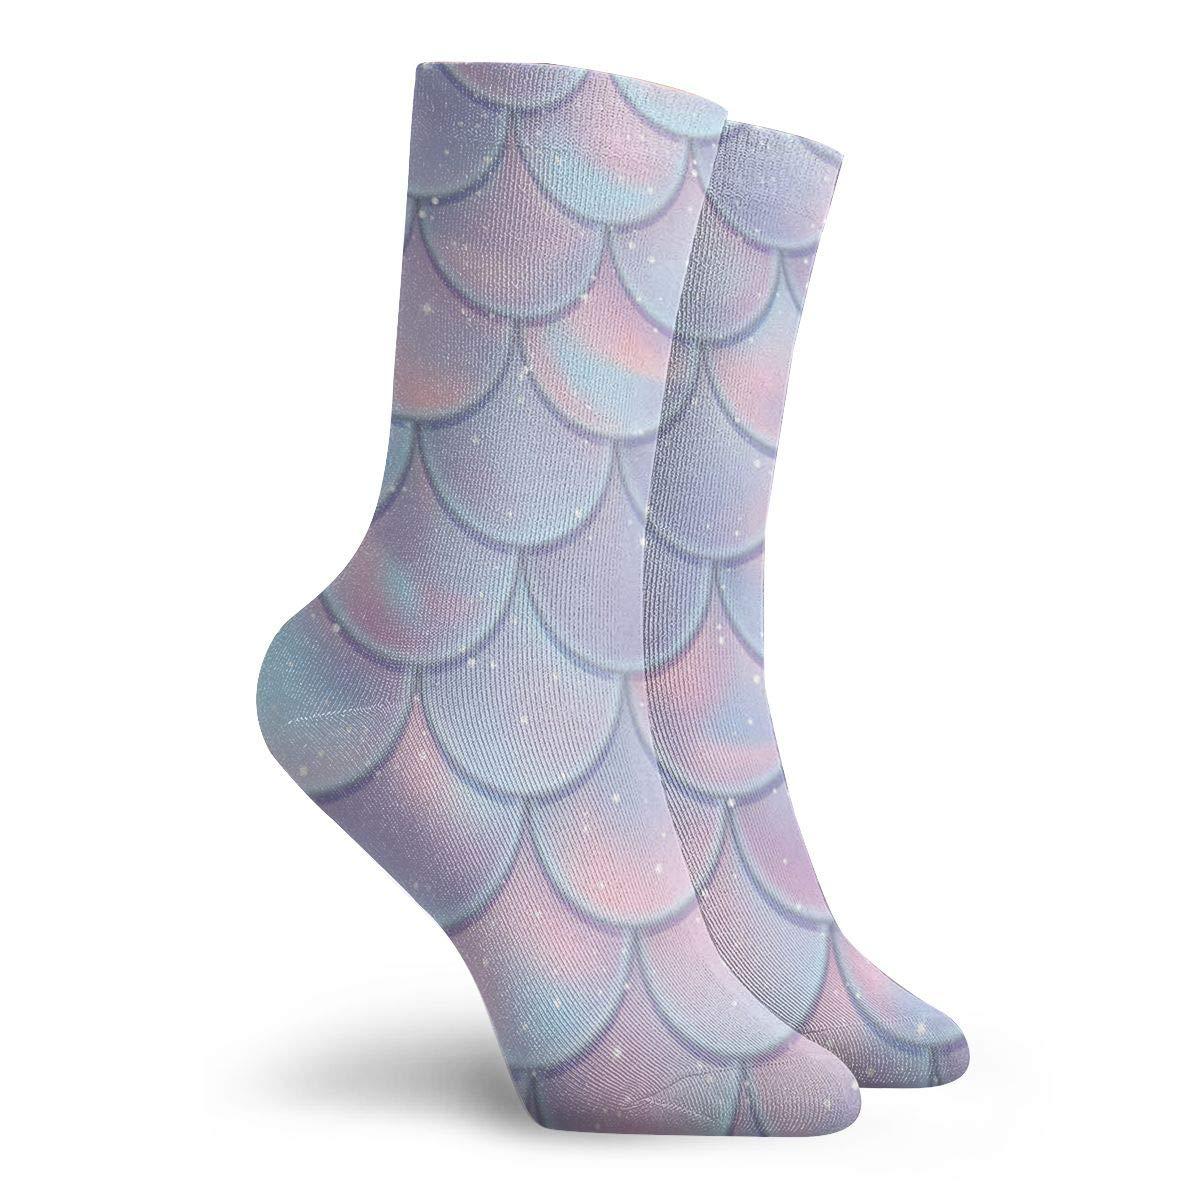 Mermaid Unisex Funny Casual Crew Socks Athletic Socks For Boys Girls Kids Teenagers